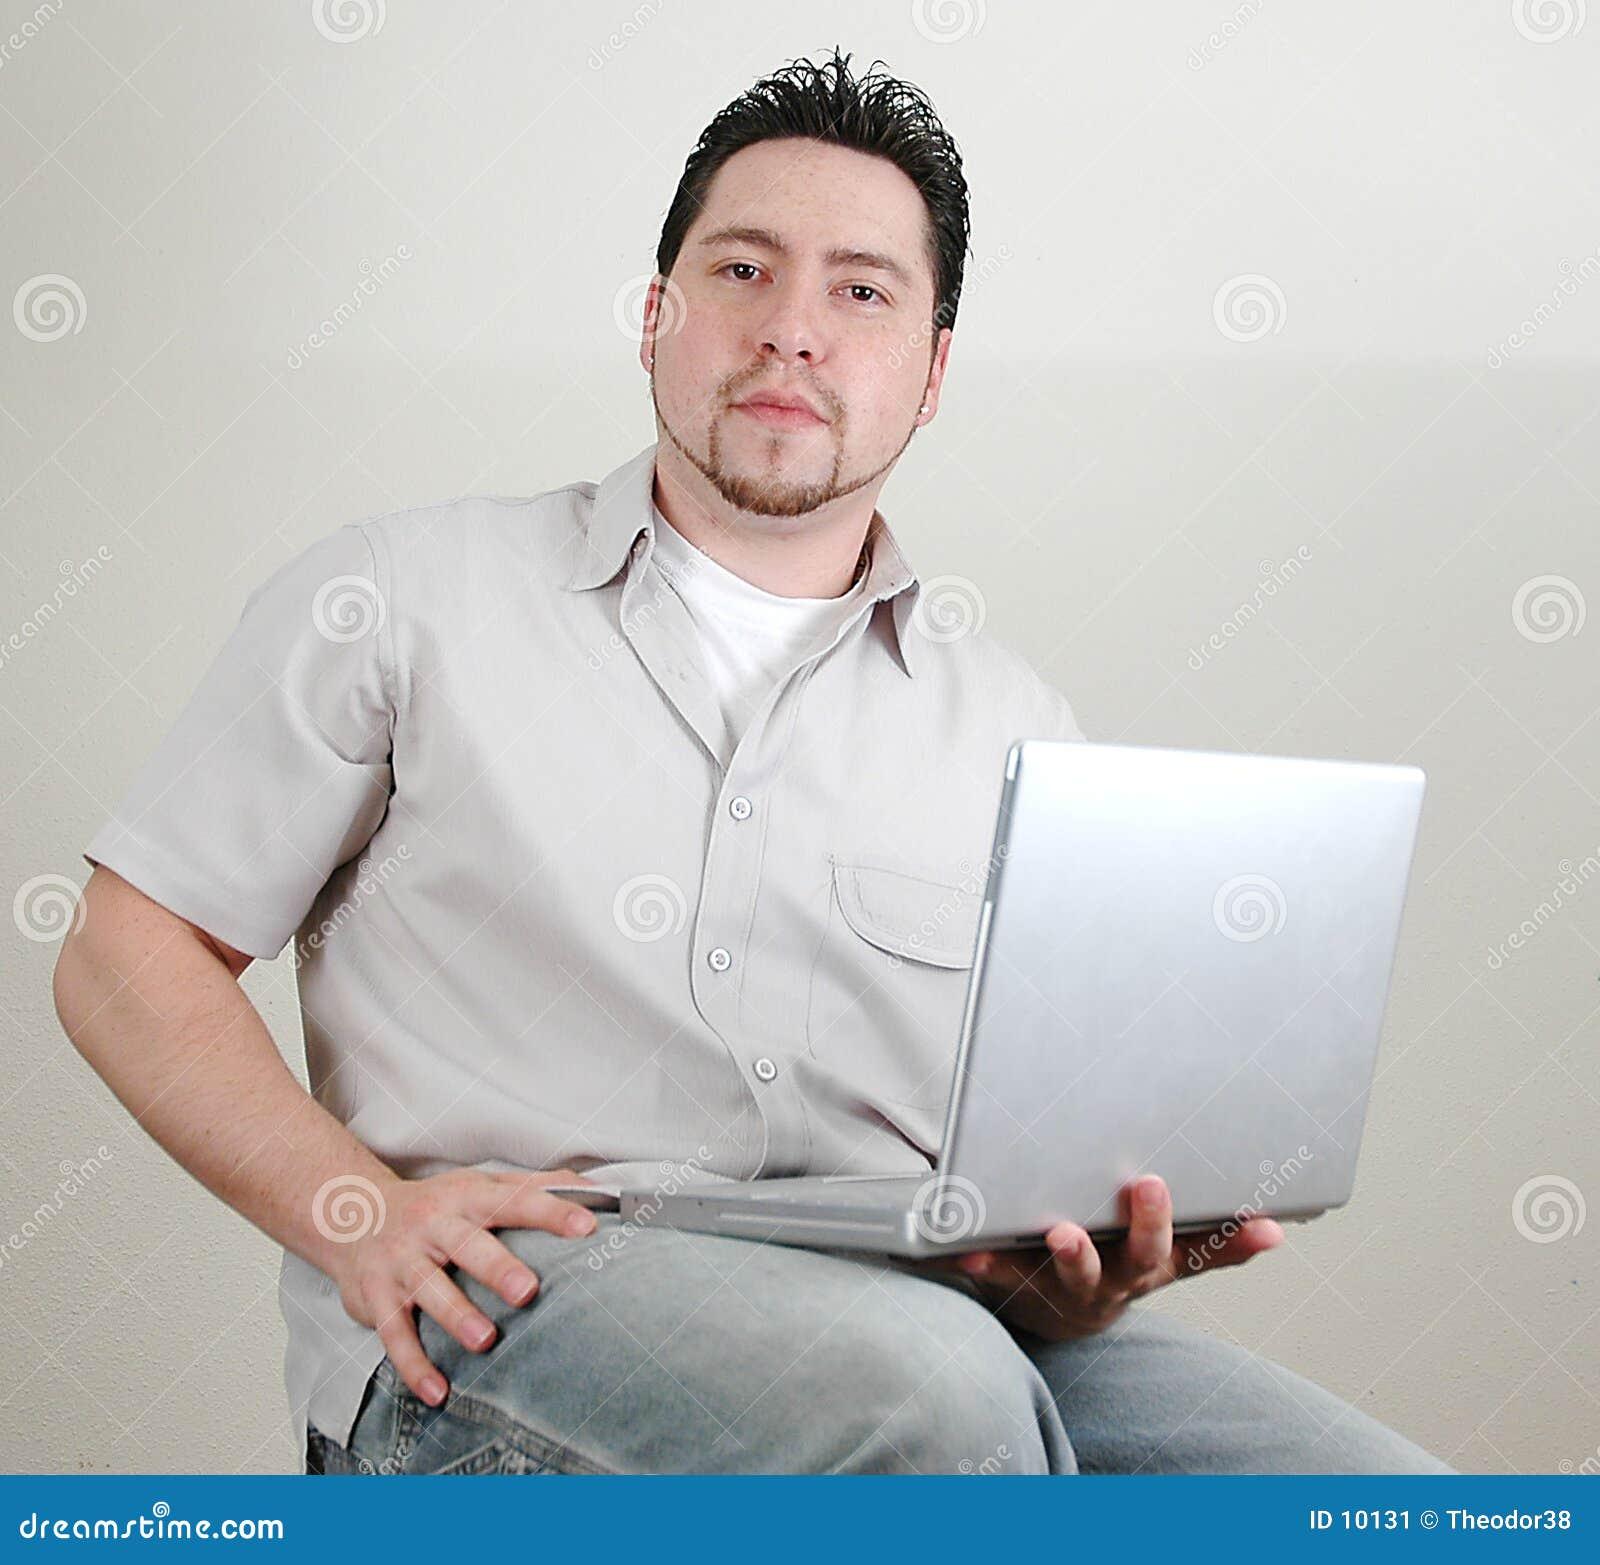 Man and computer-6